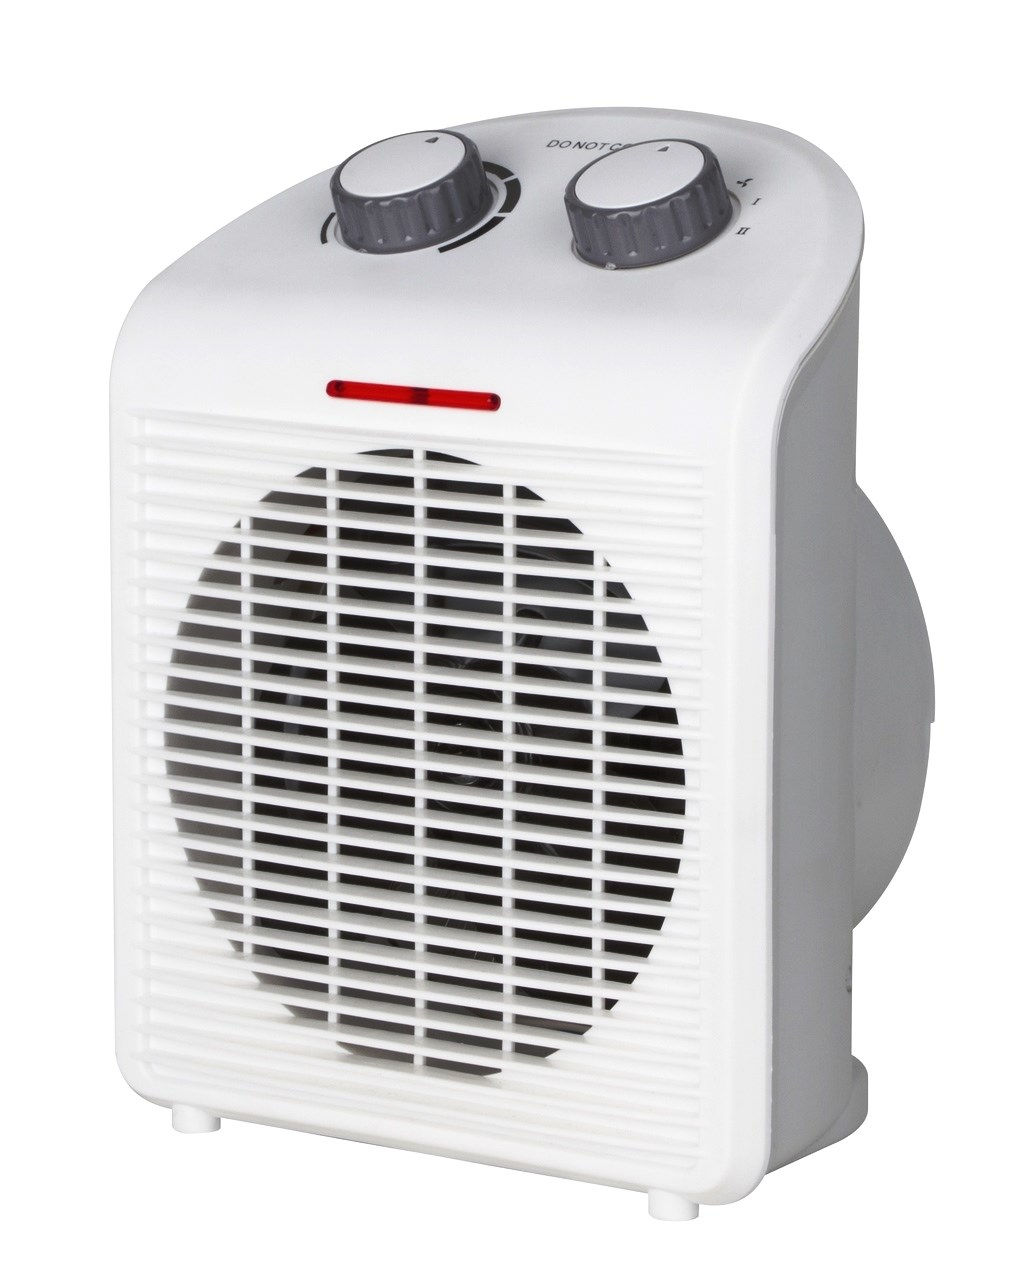 Buy The World Mktg Efh1518 Comfort Glow Electric Fan